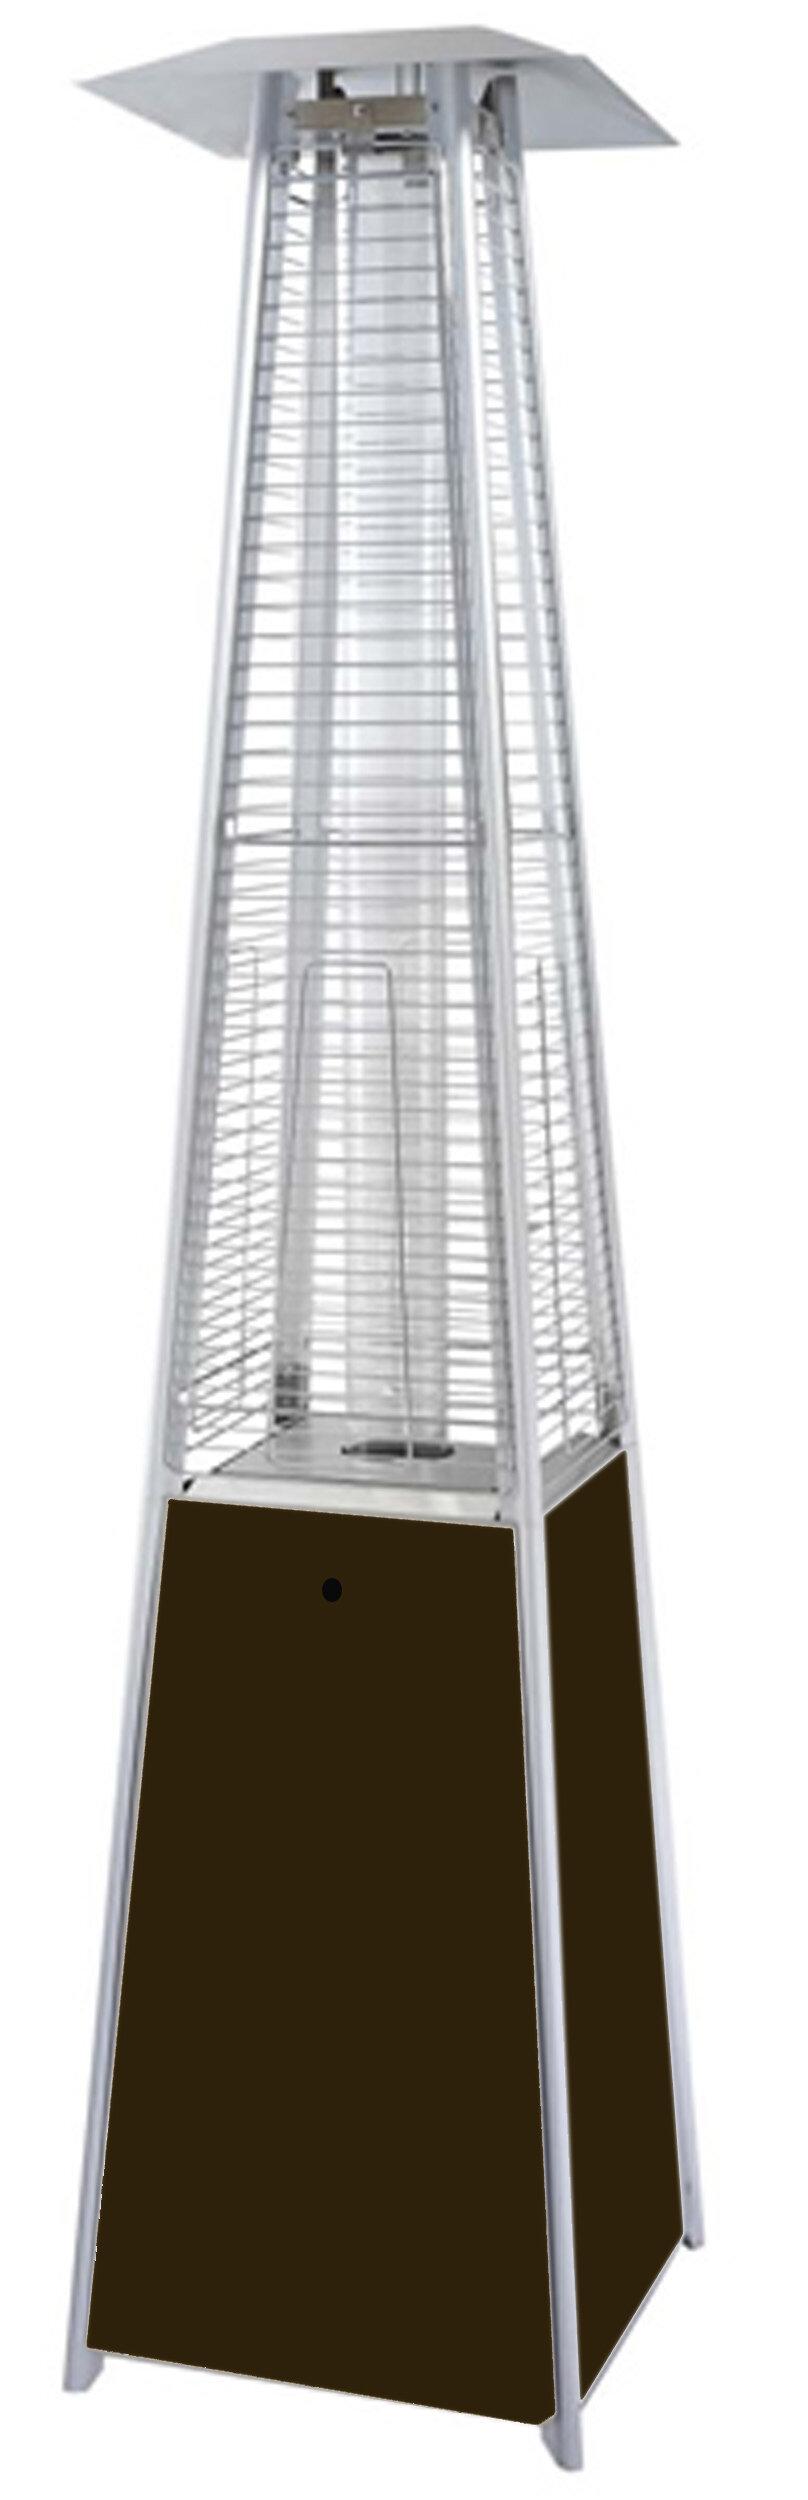 main bullet standing floor steel patio stainless gas heater